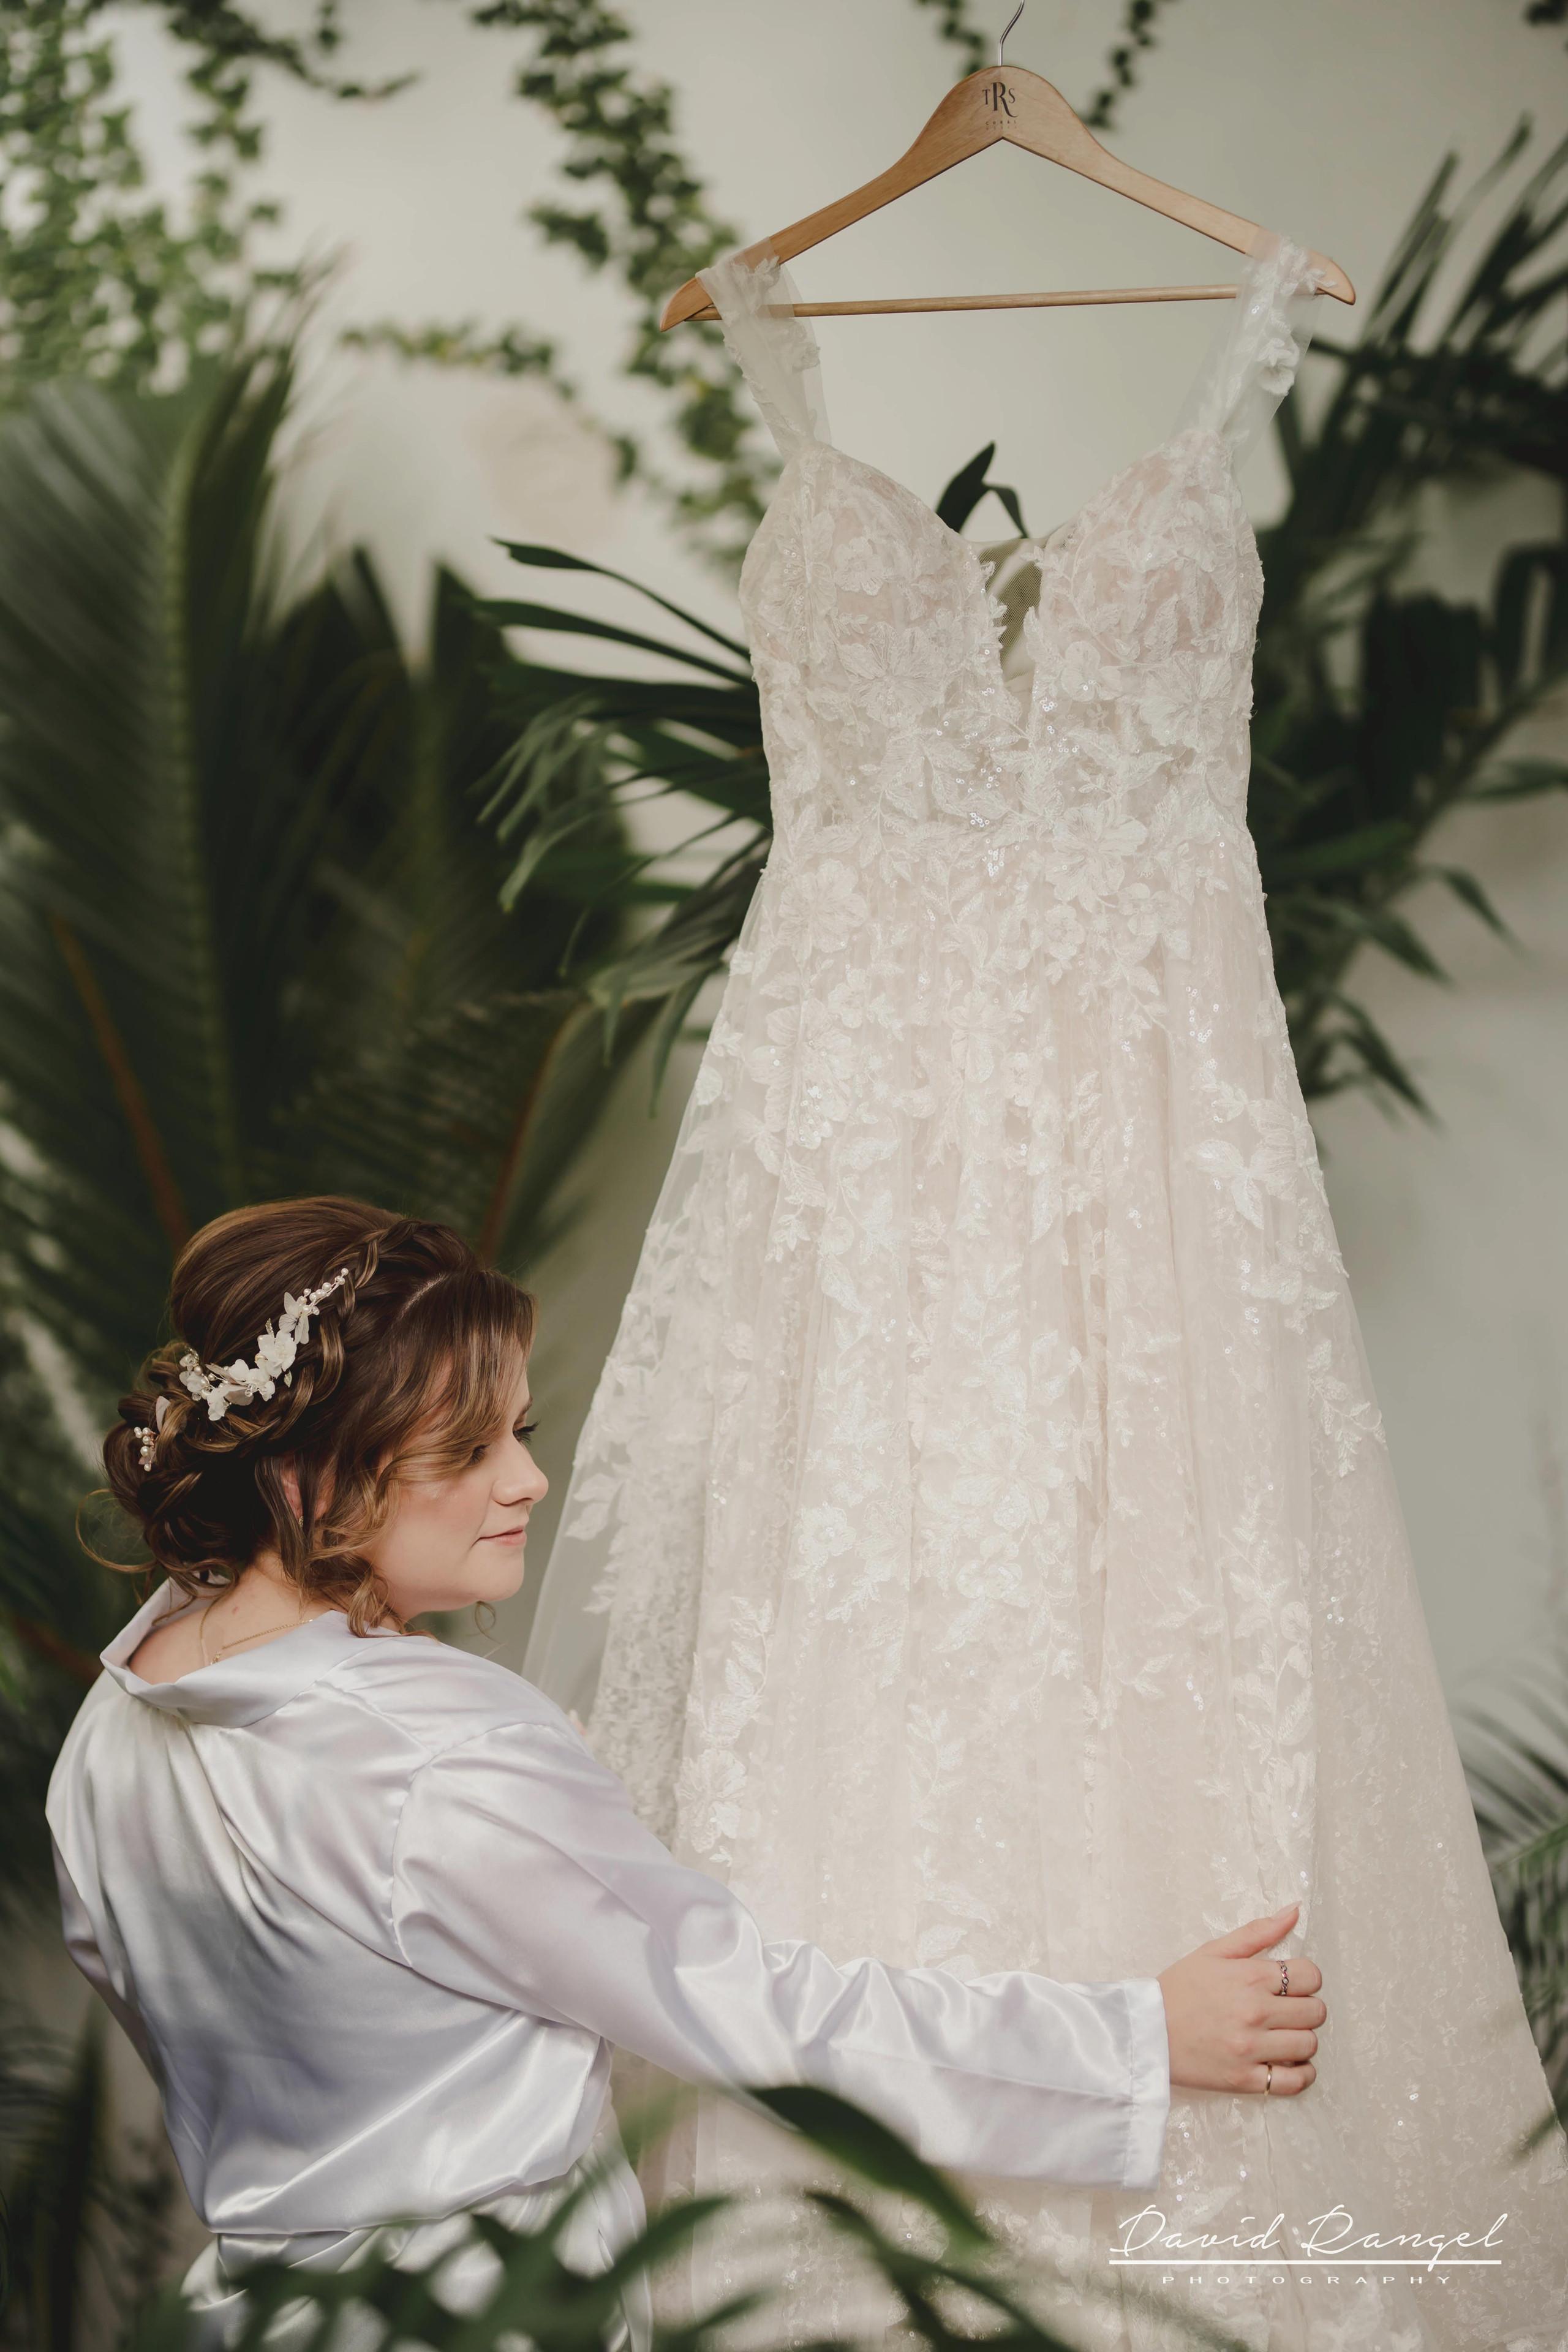 bride+getting+ready+shadow+earring++bathrobe+natural+ligh+photo+destination+wedding+isla+blanca+smile+mirror+photo+celebration+wedding+dress